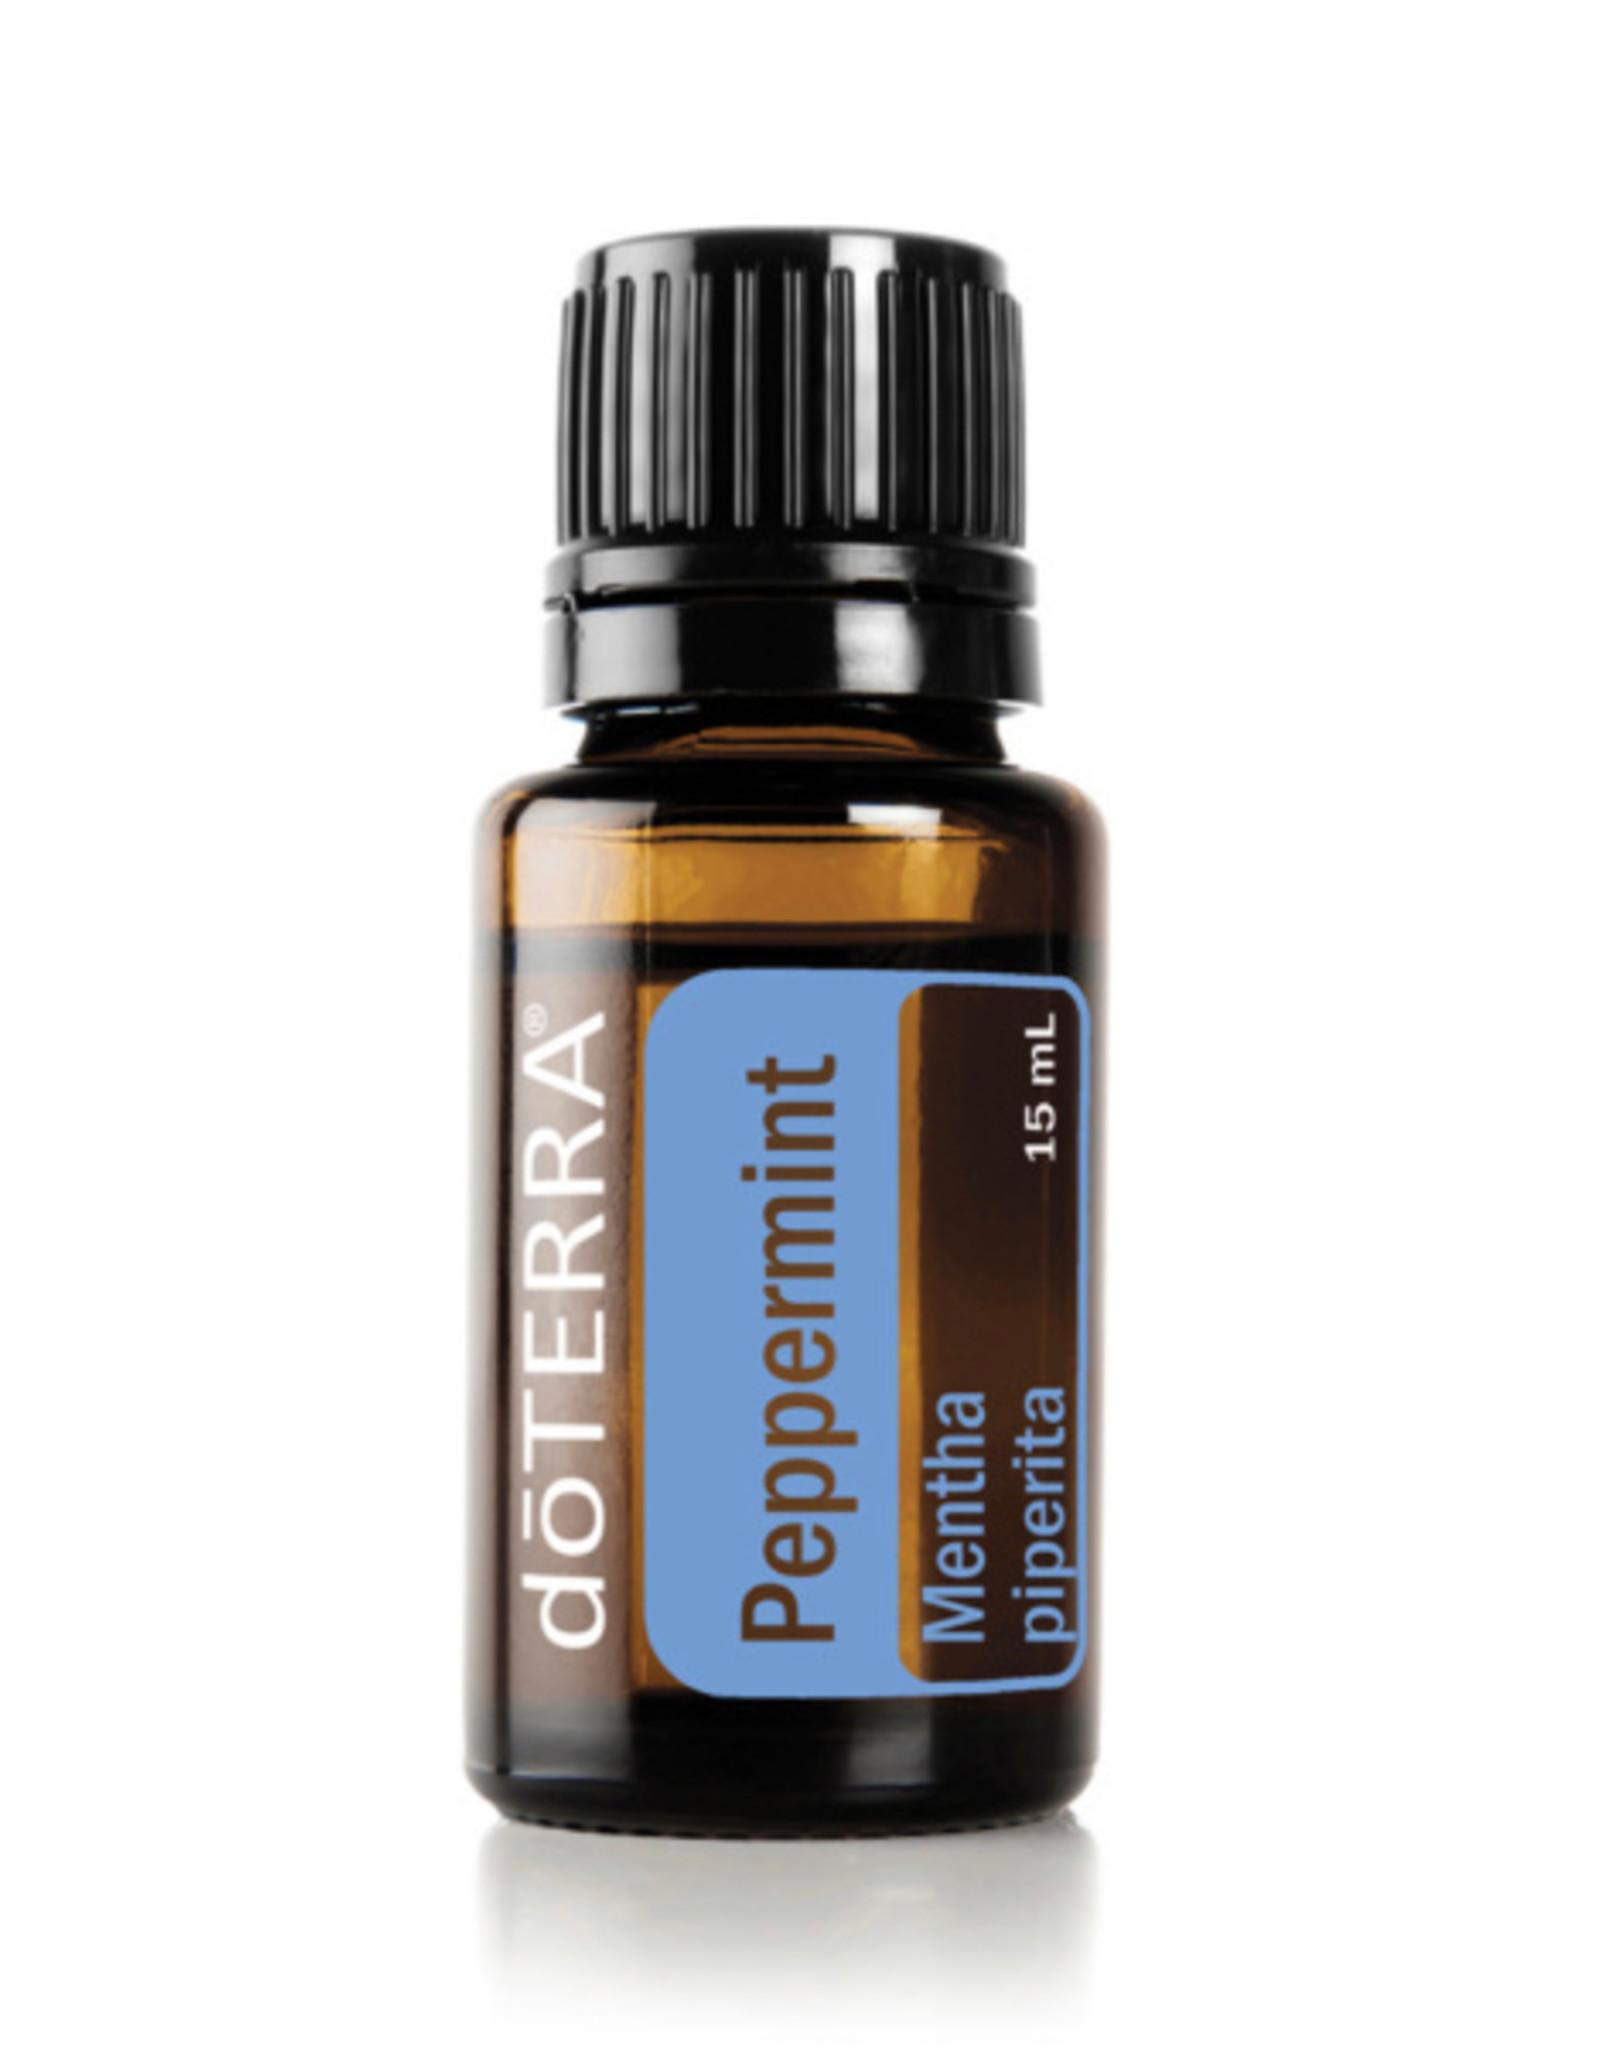 dōTERRA Peppermint